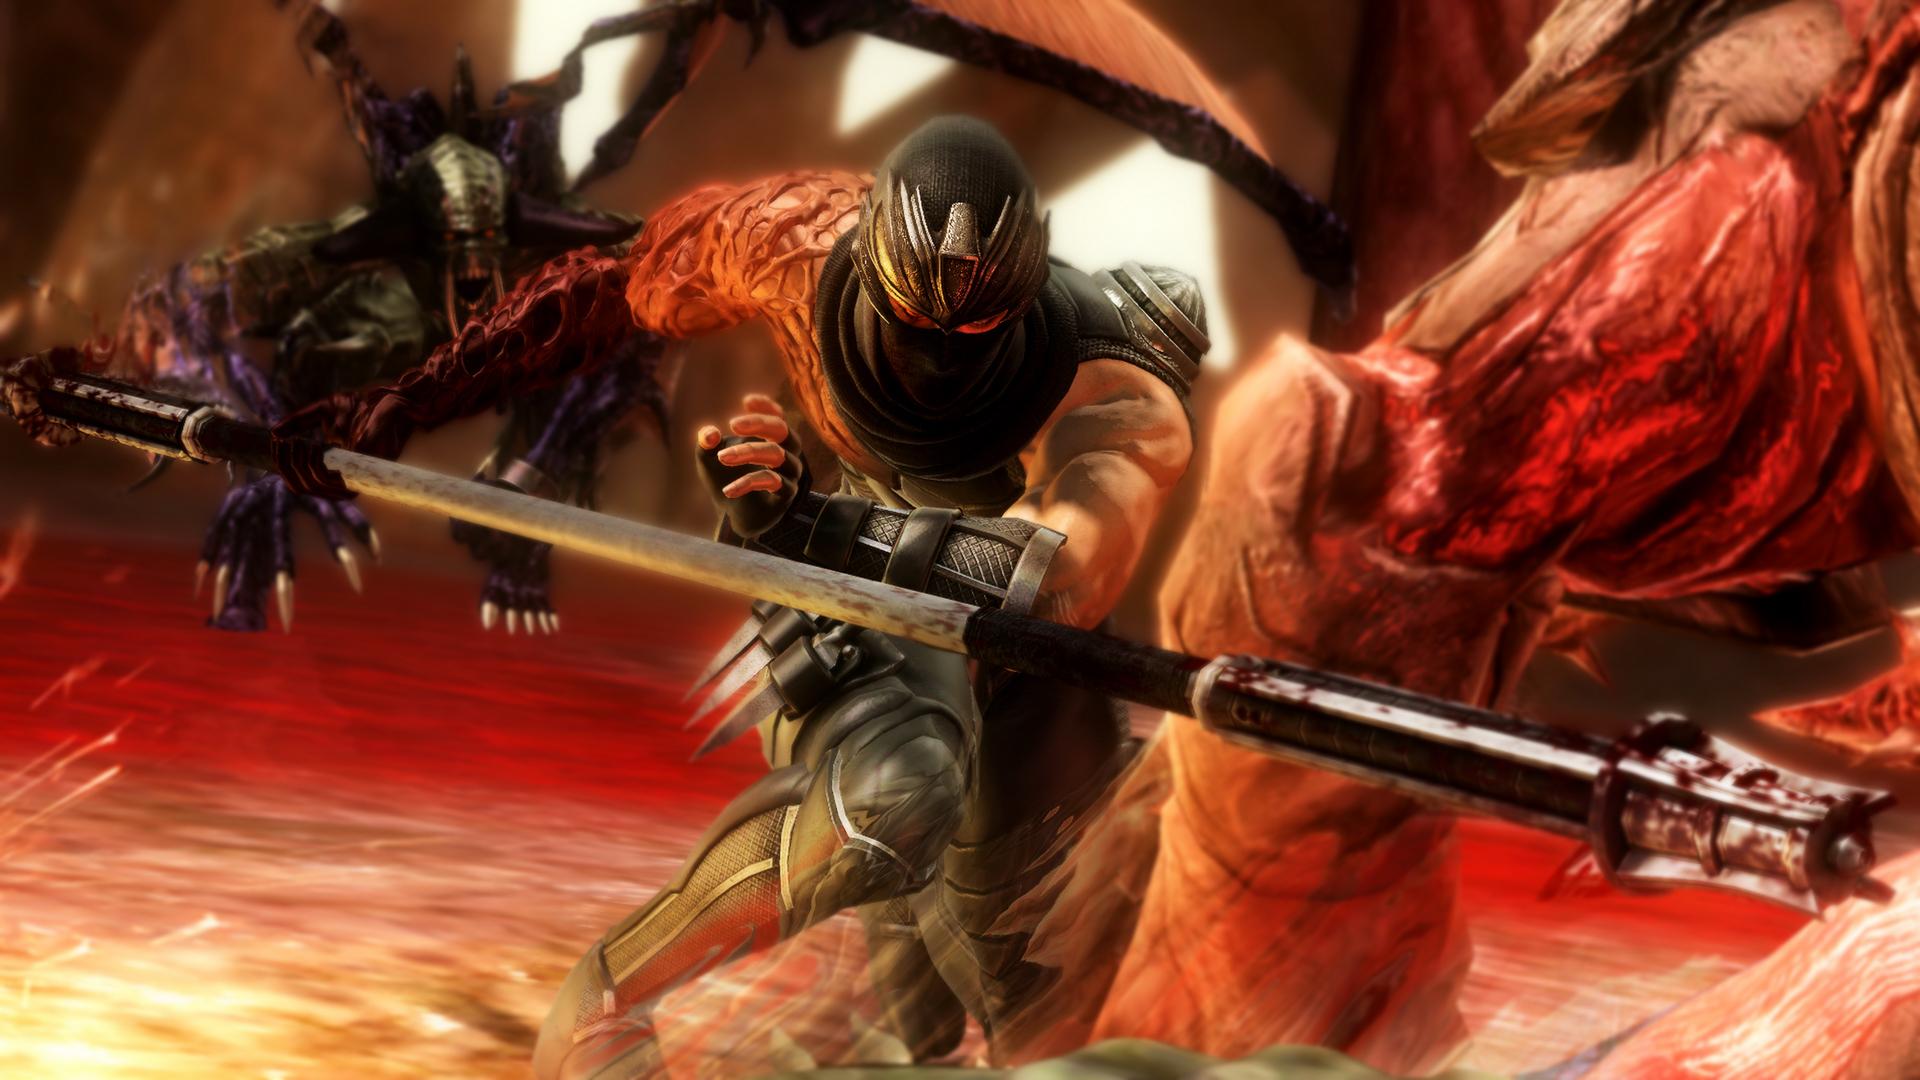 Ninja Gaiden Will Return Eventually, Team Ninja Suggests